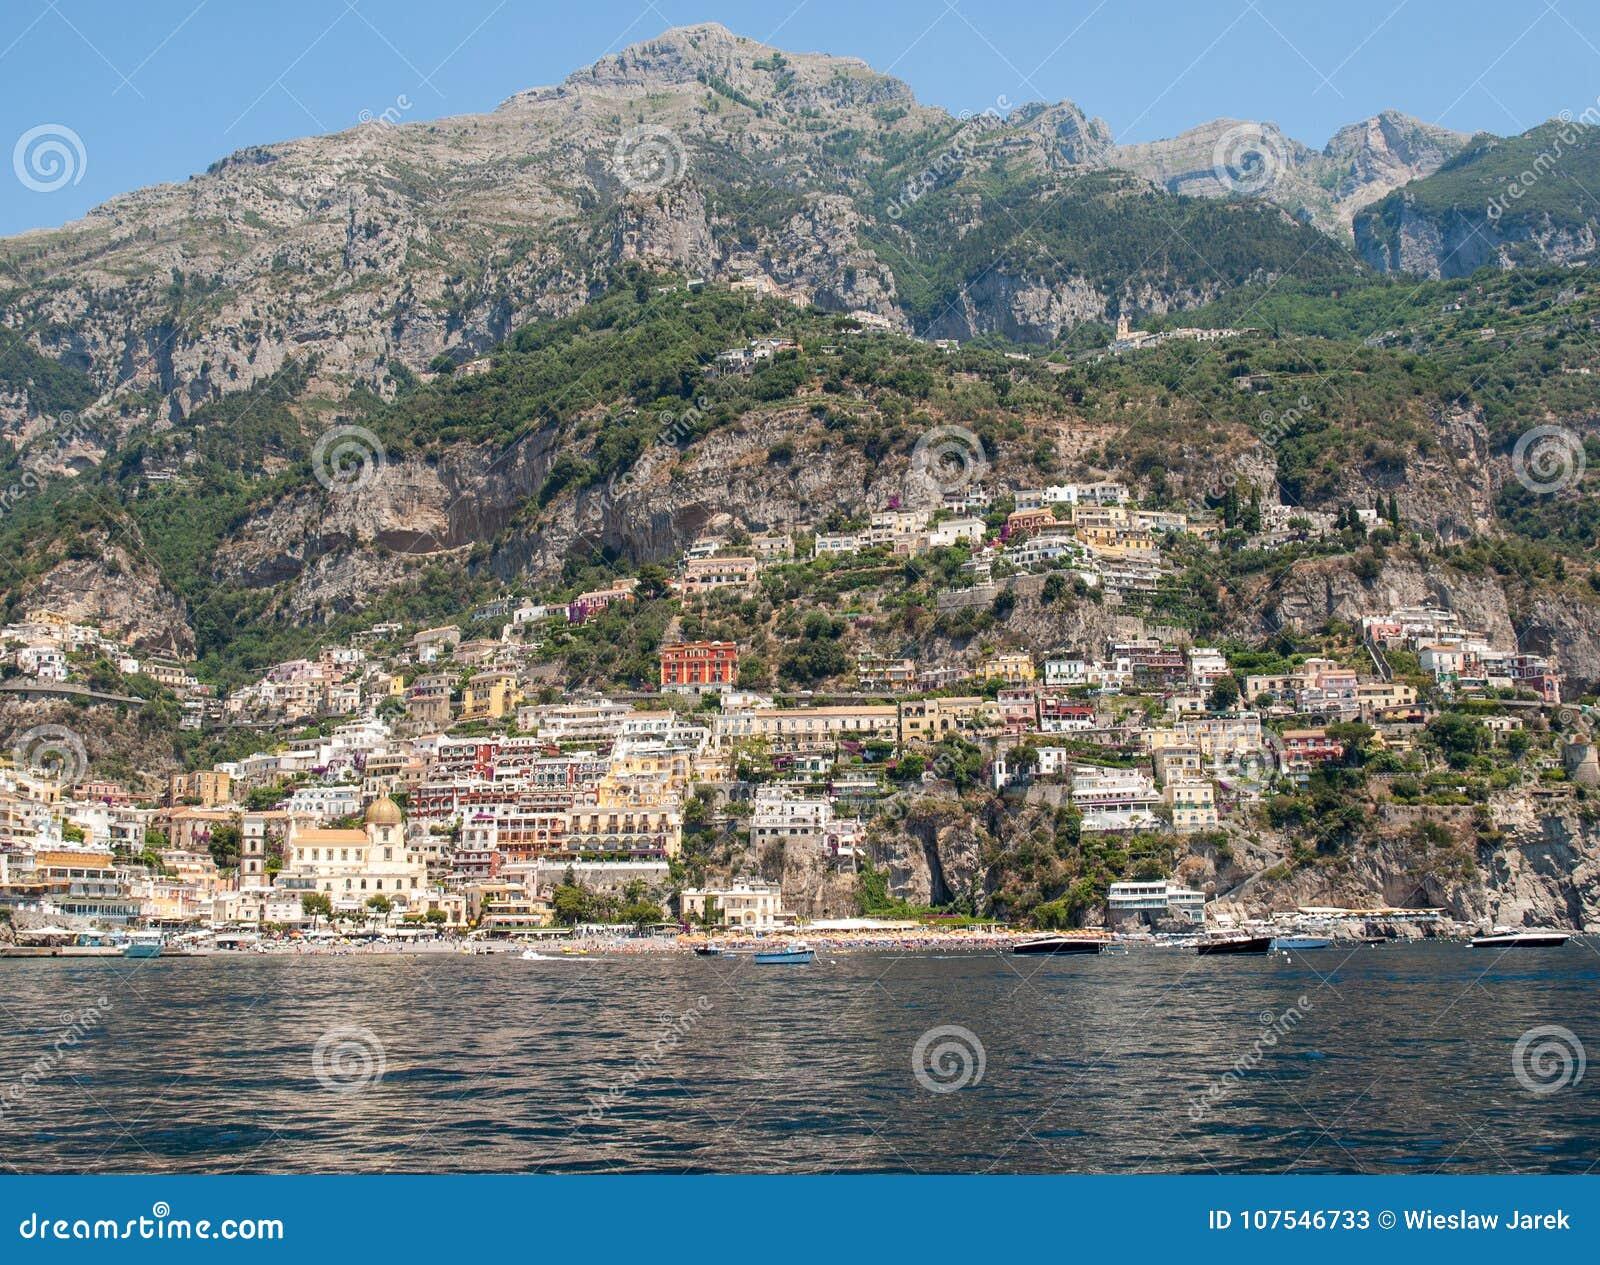 Buntes Positano, das Juwel der Amalfi-Küste,